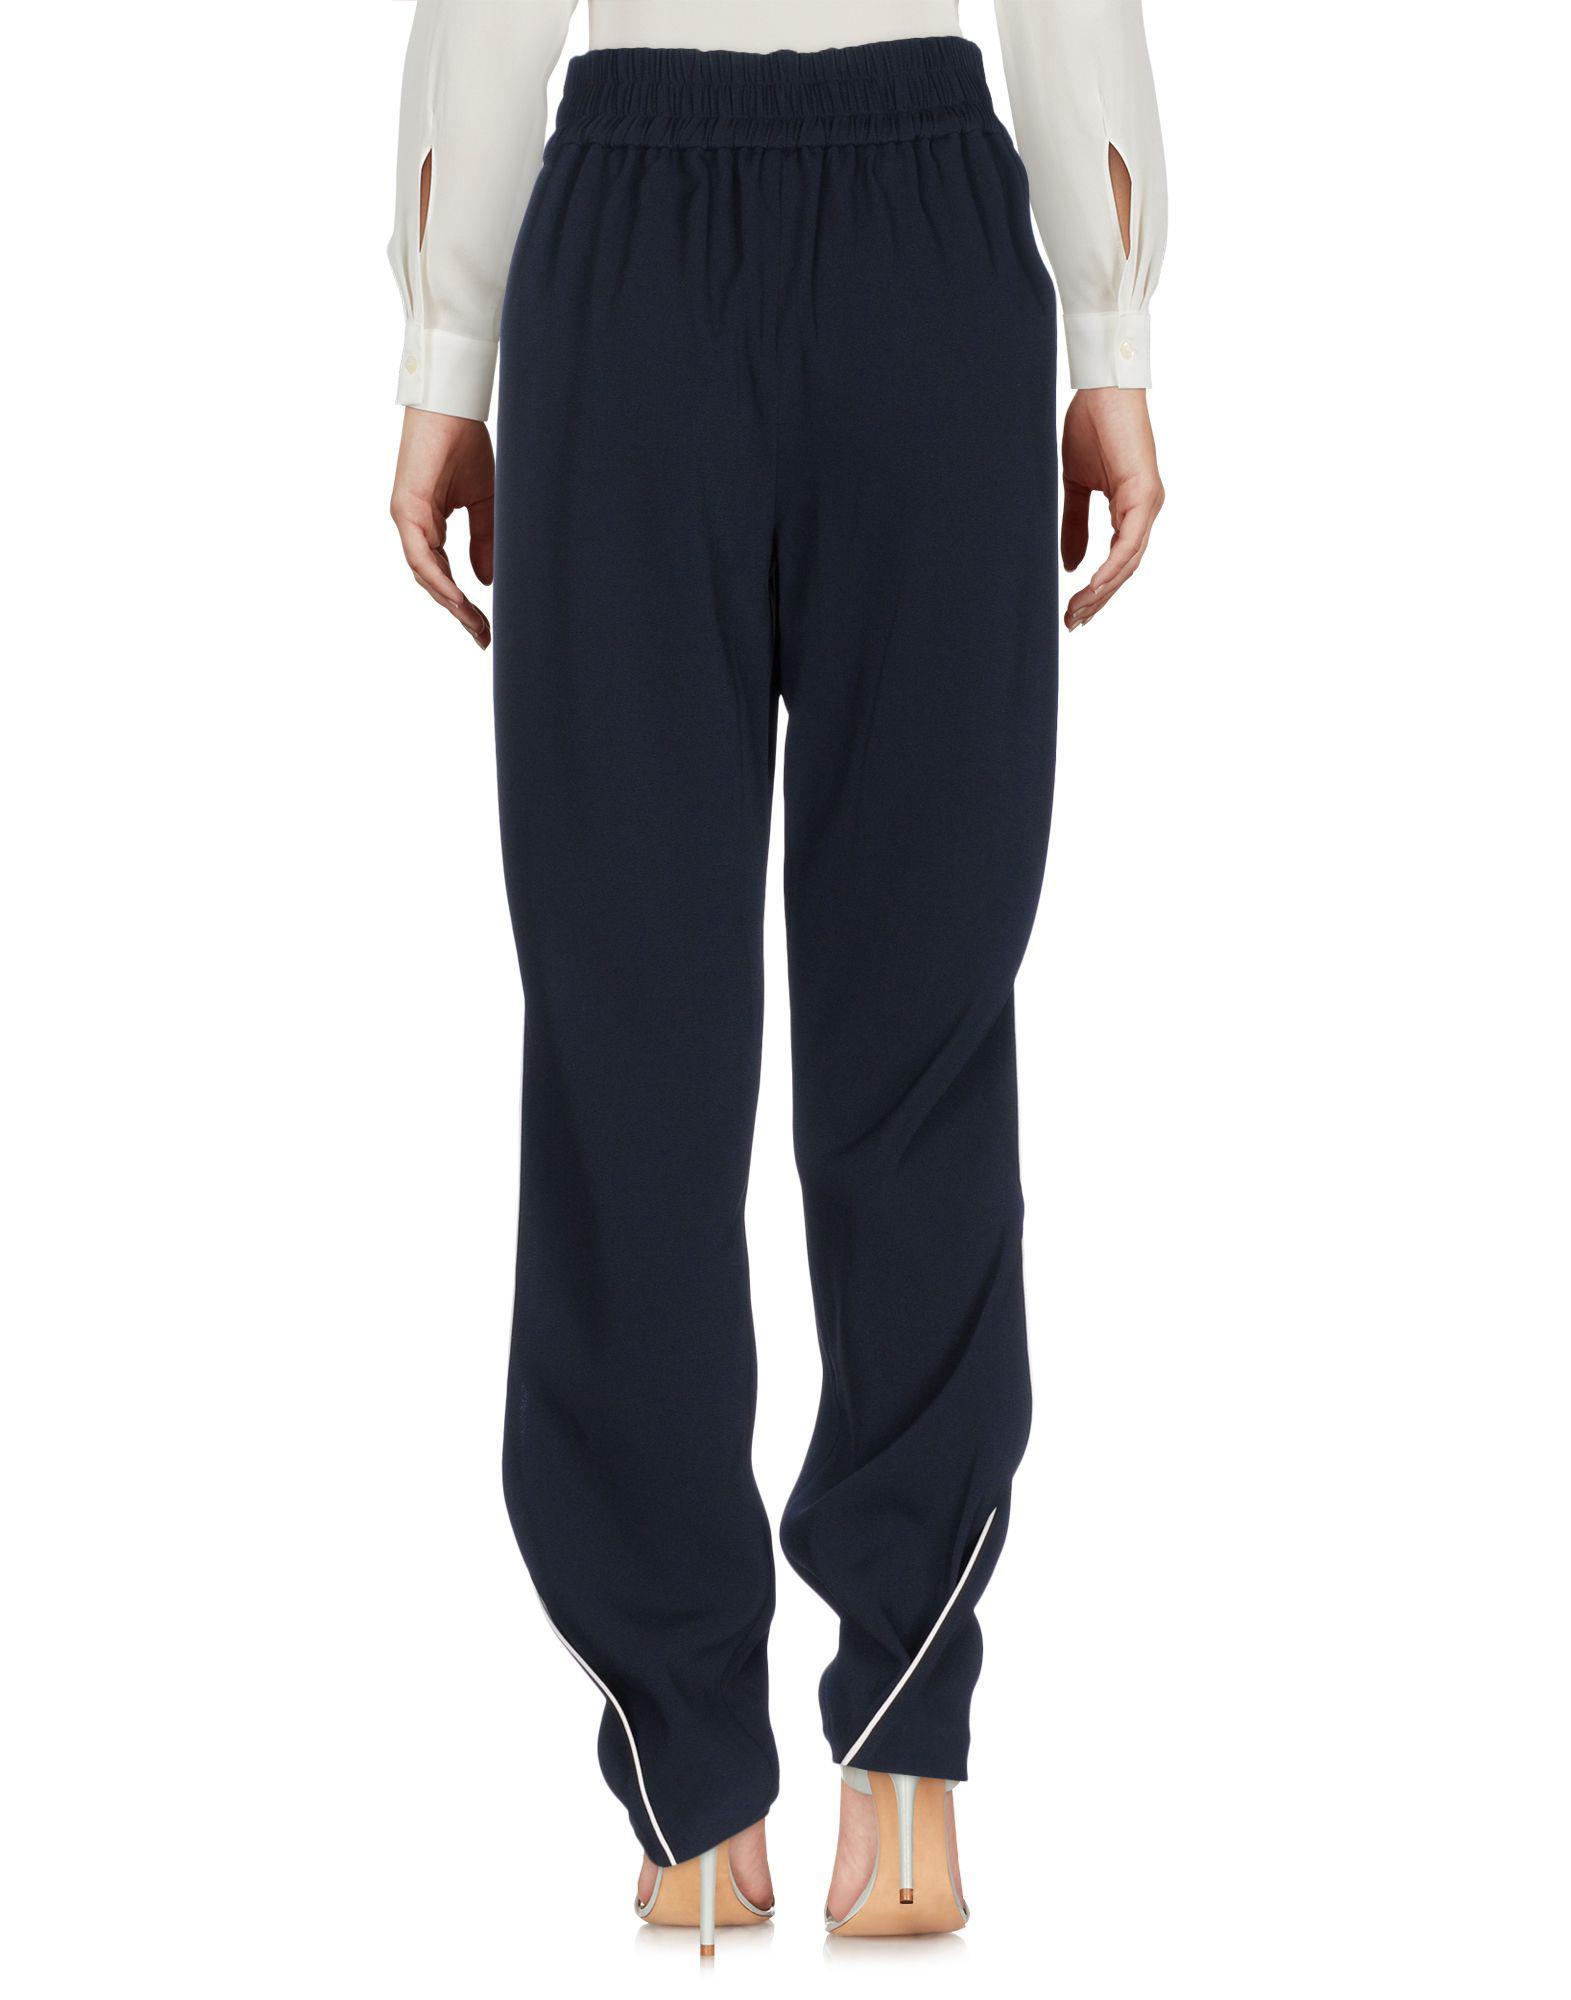 Pantalon Synthétique Jonathan Simkhai en coloris Bleu